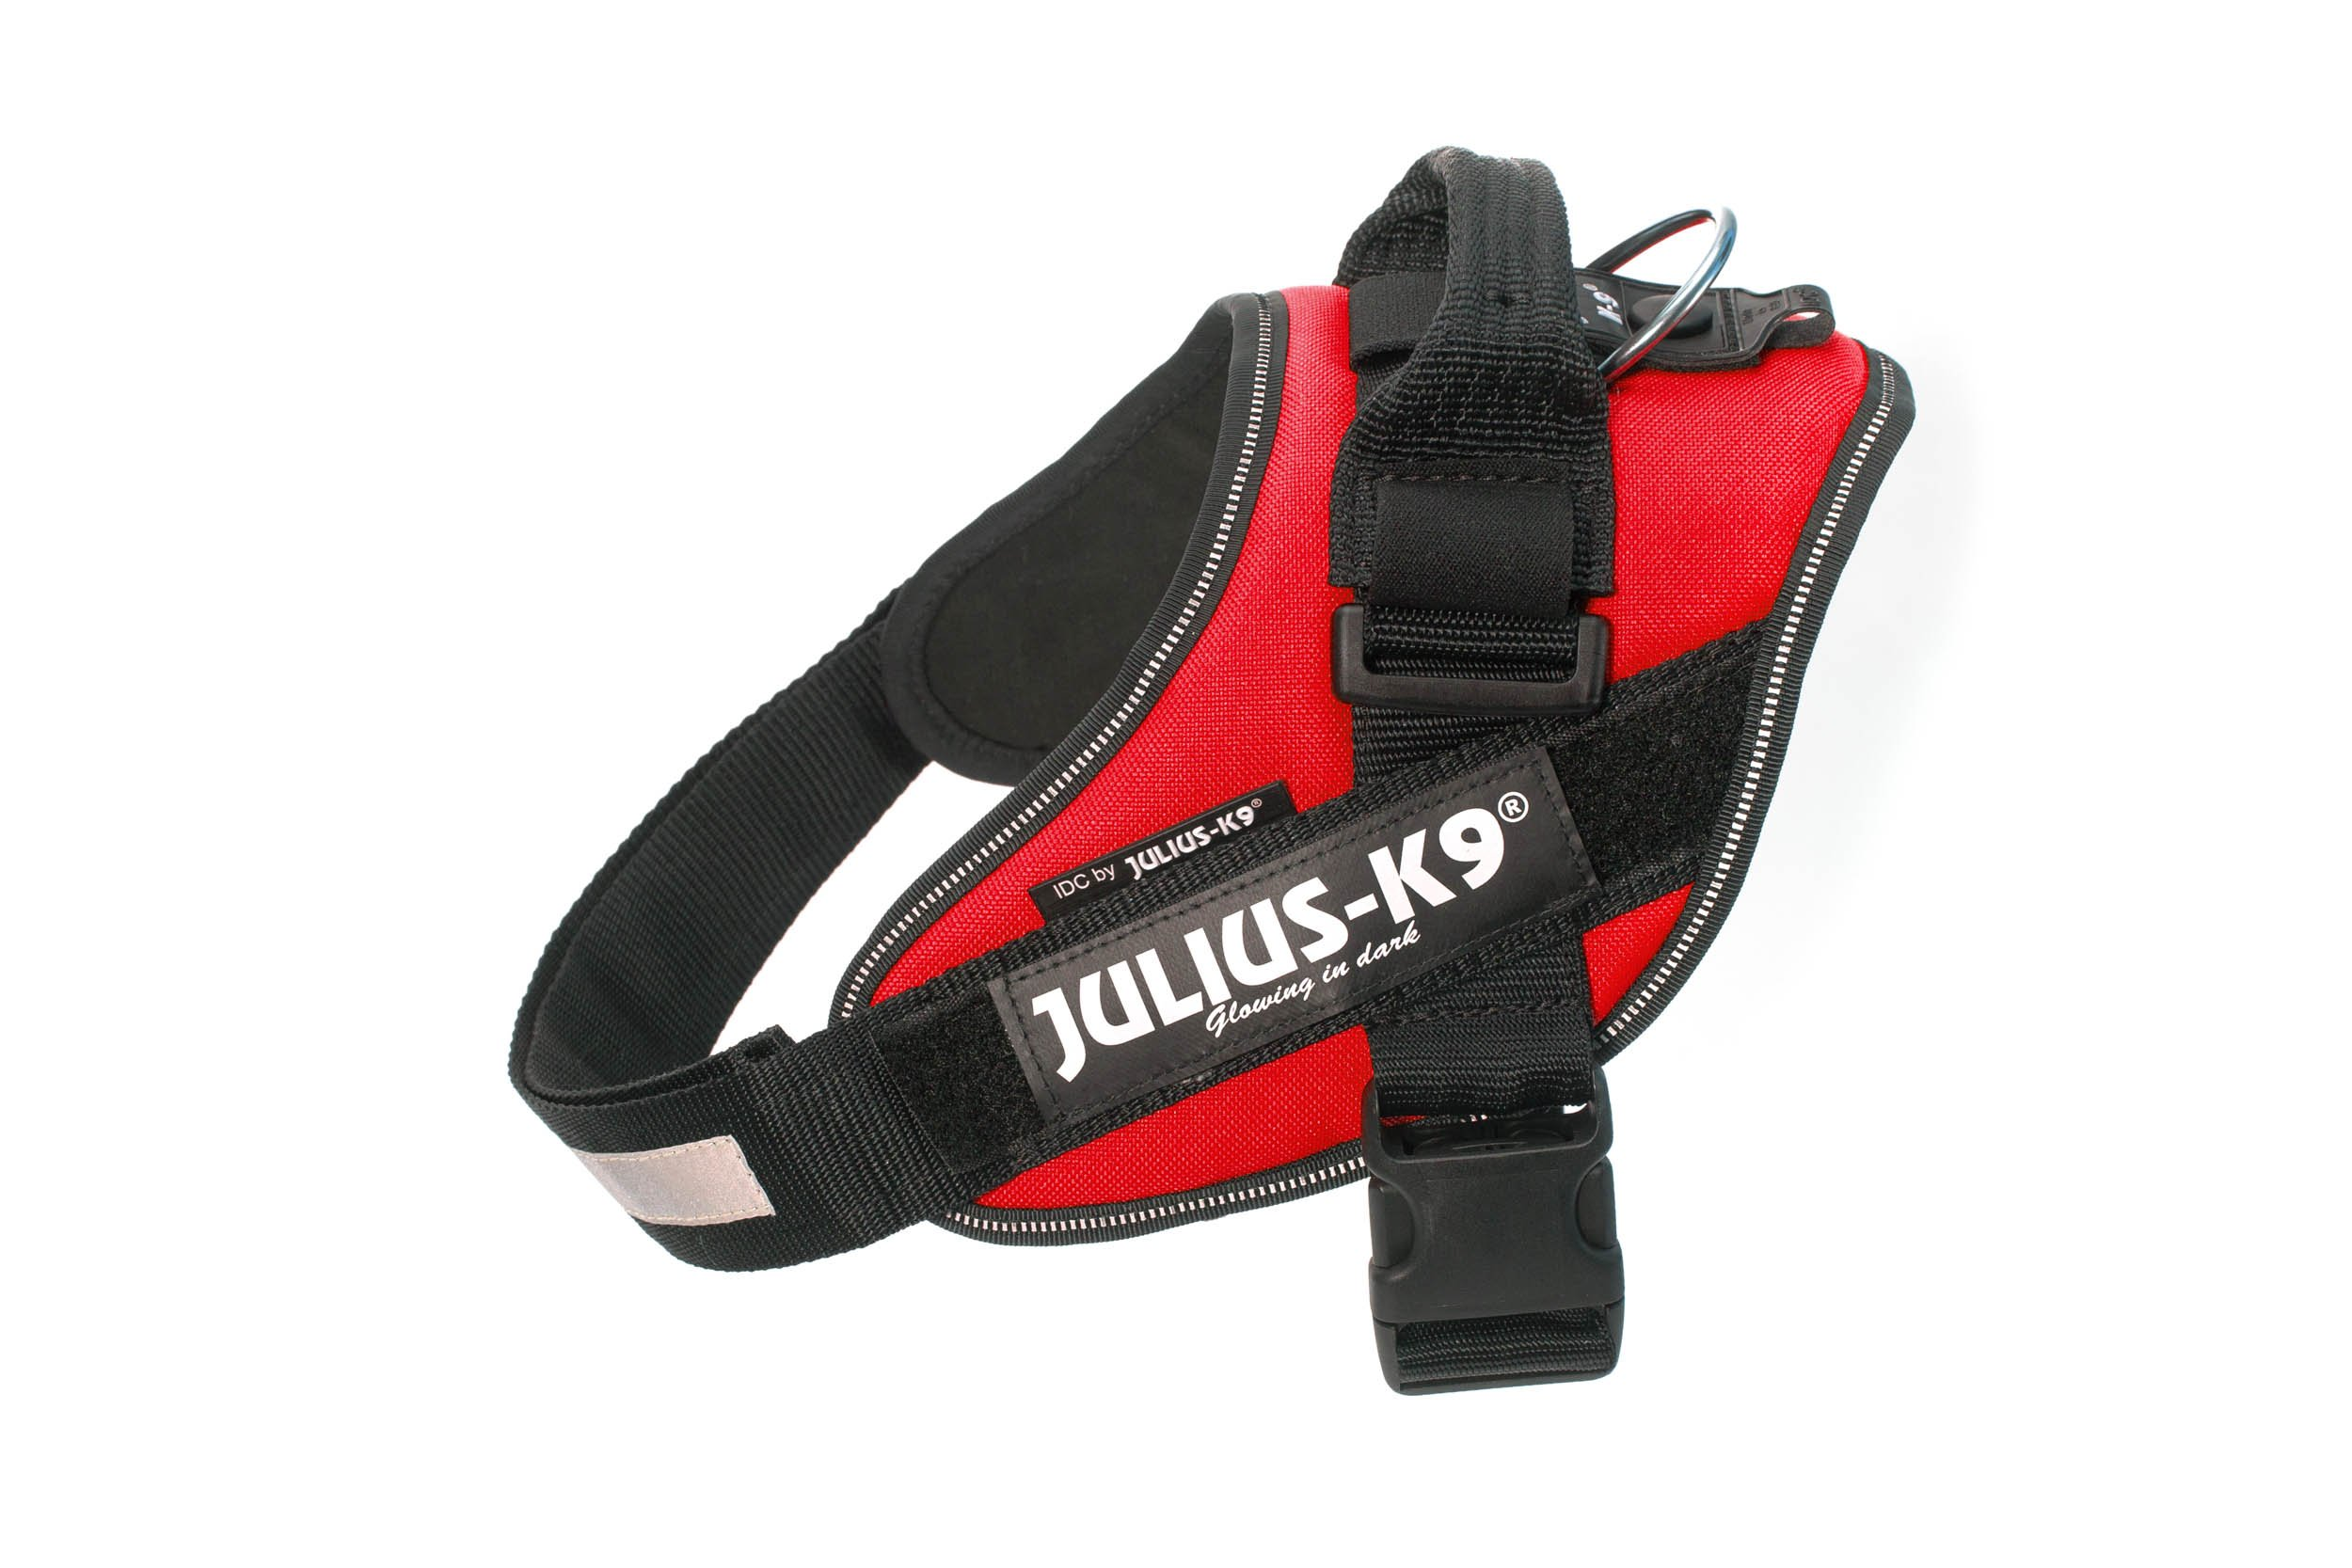 9e42d789947a Julius-K9 16IDC-R-0 IDC Power Harness